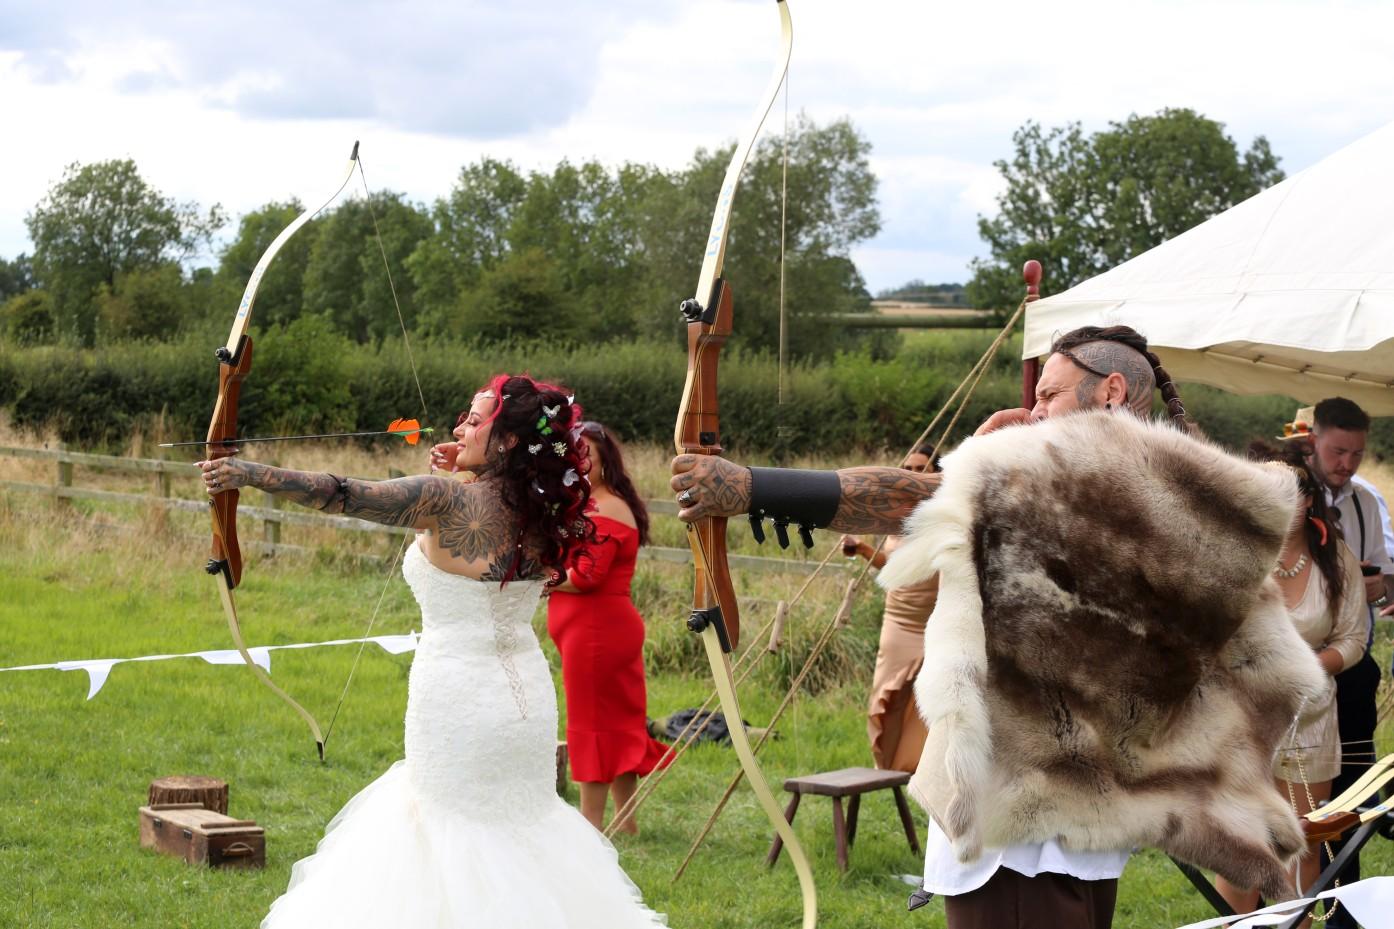 bride and groom doing archery - wedding archery - festival viking wedding - alternative wedding inspiration - unconventional wedding - alternative wedding blog